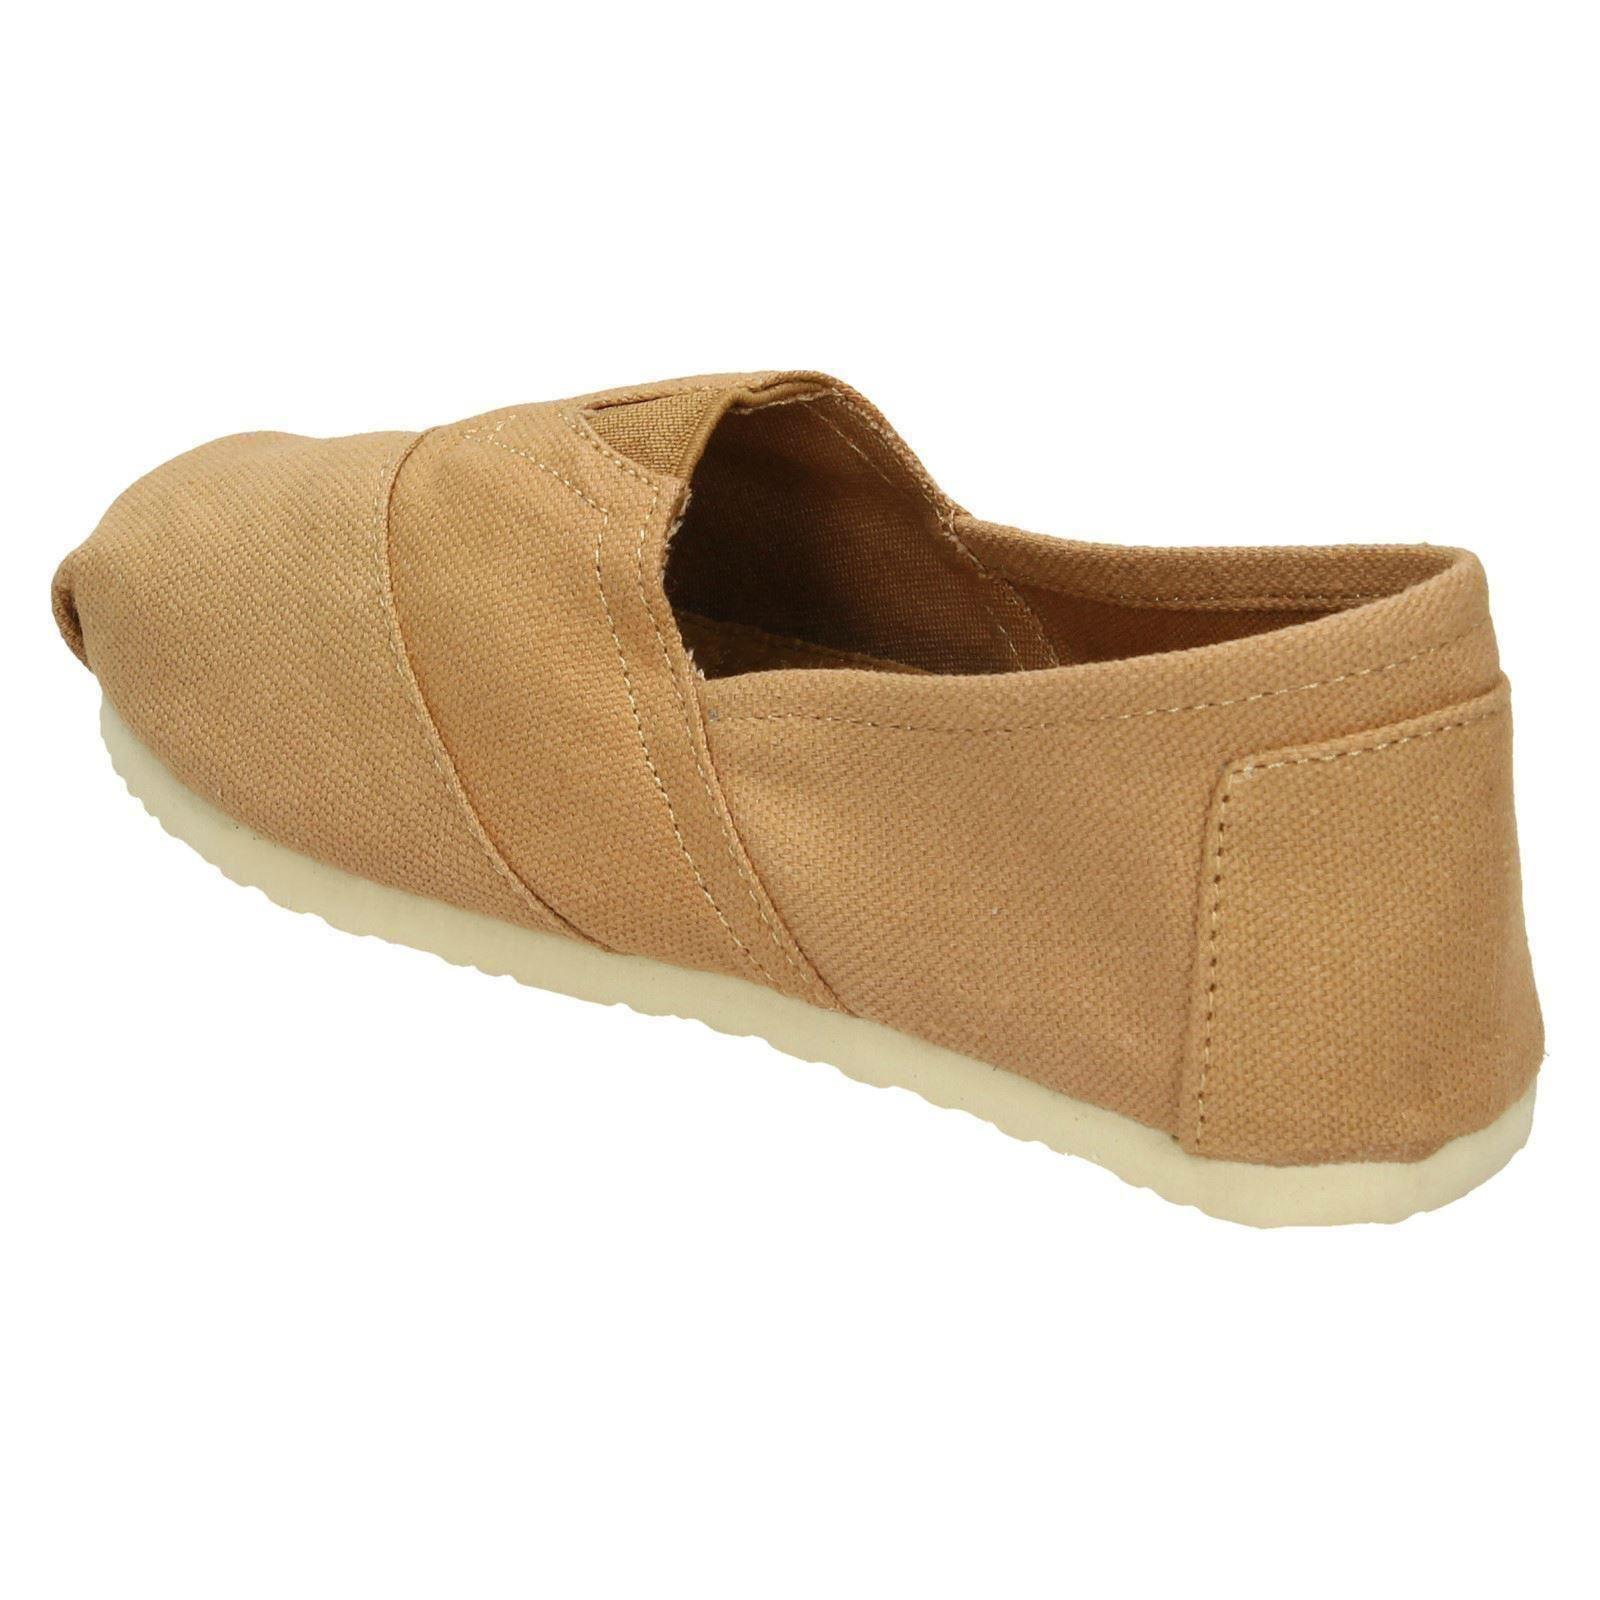 Boys ZigZag Canvas Shoes